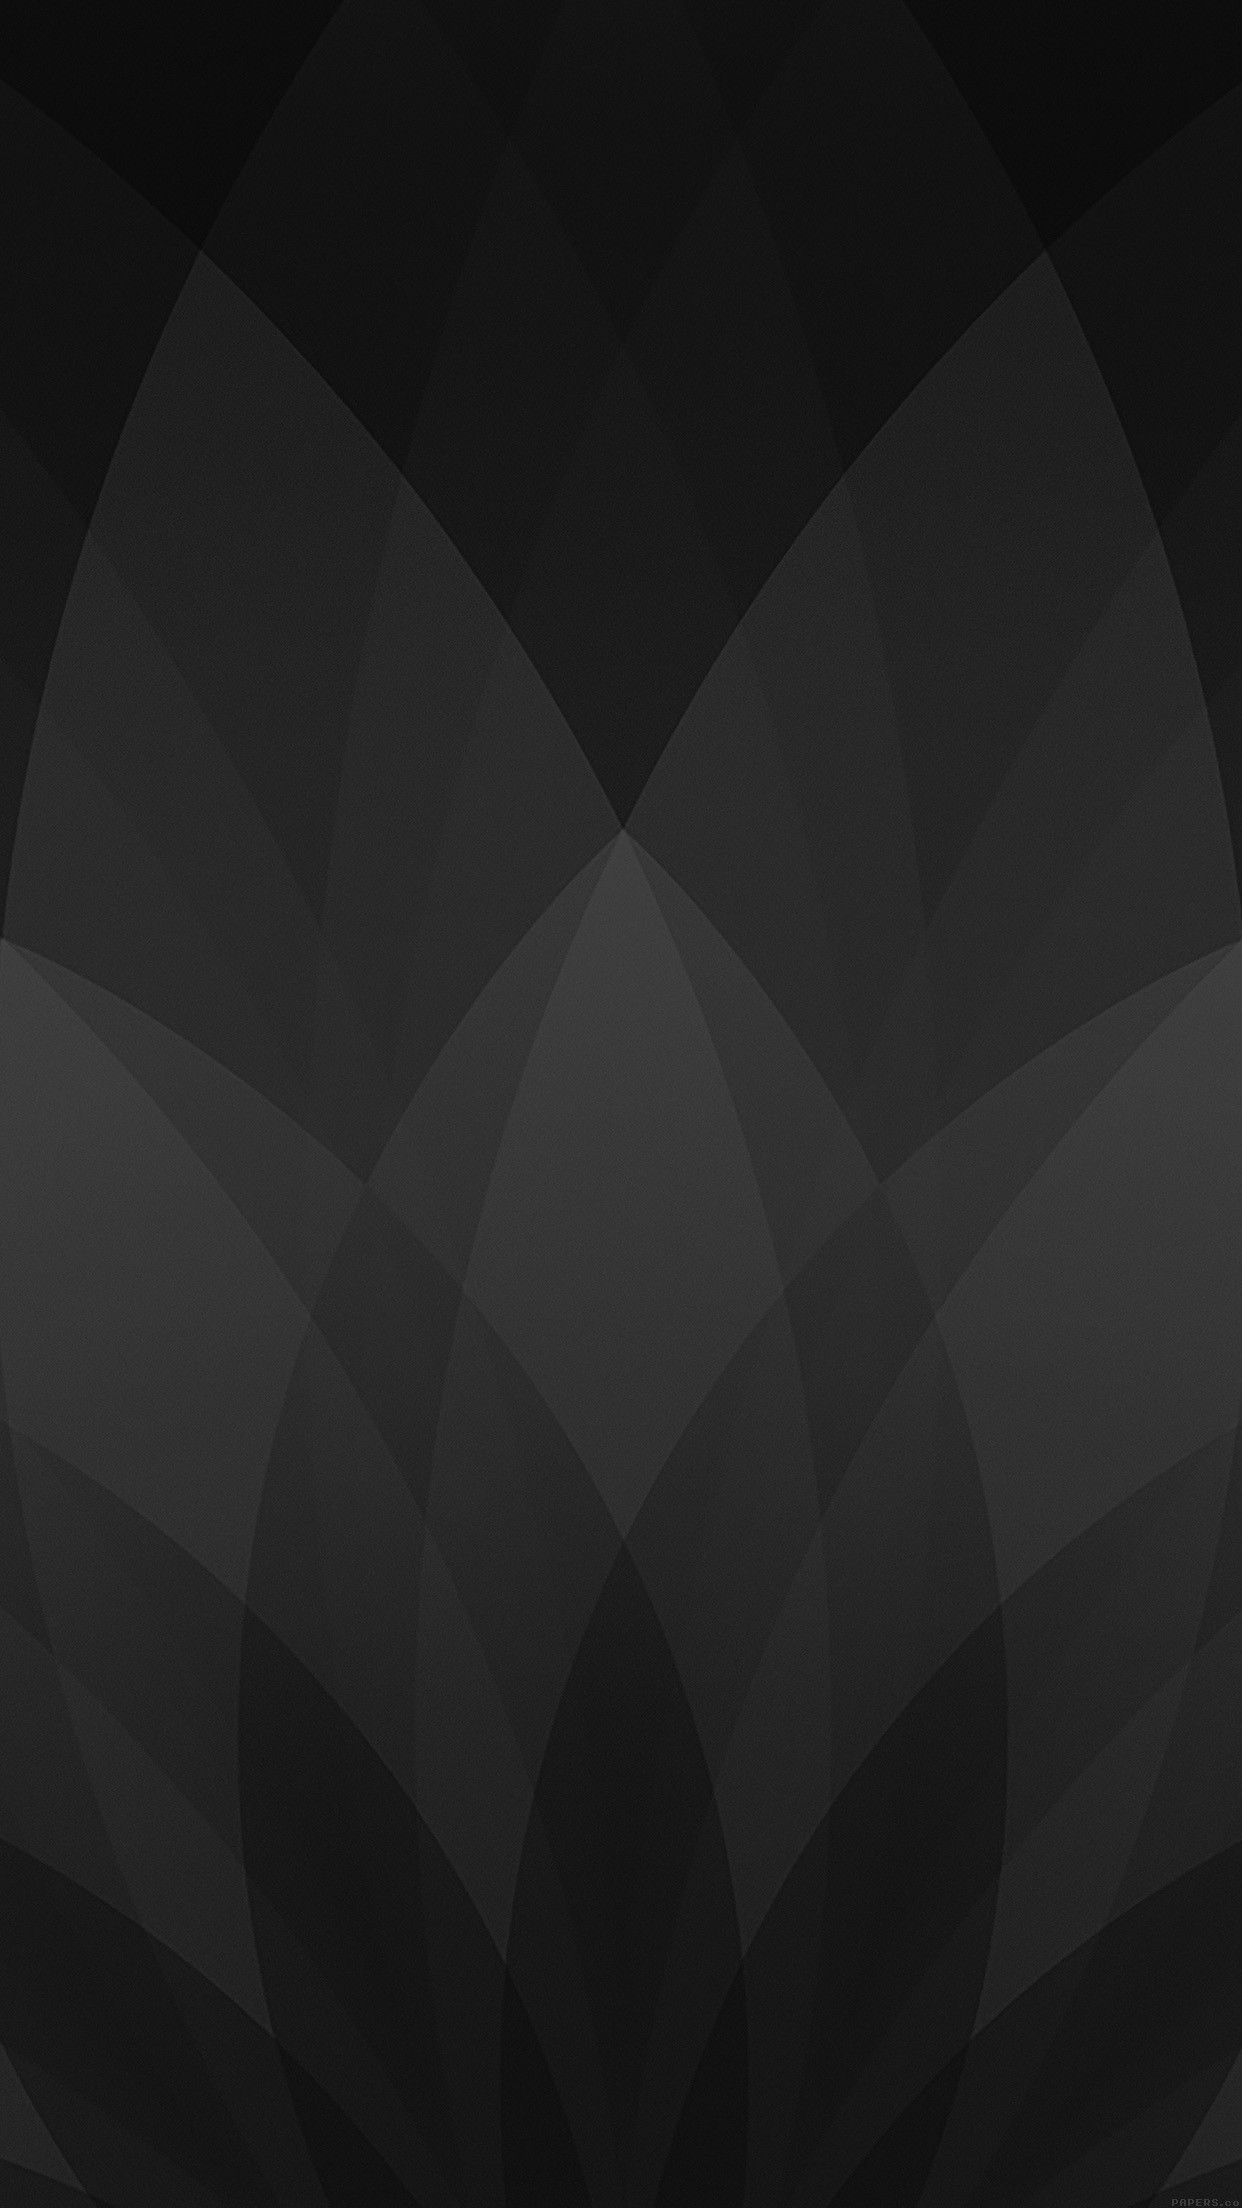 sofa-black-texture-pattern-34-iphone-7-plus-